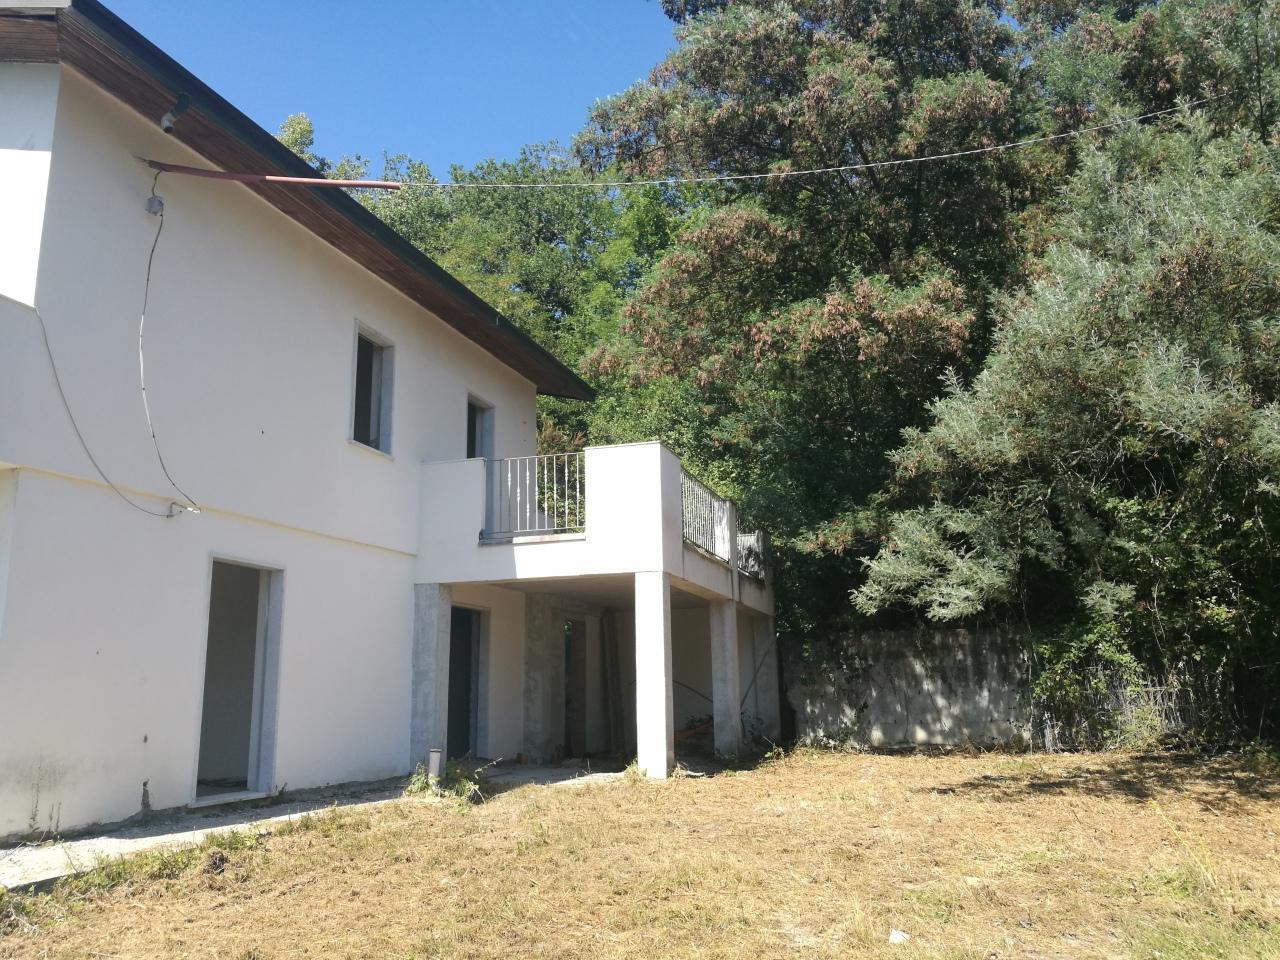 Villa singola in vendita, rif. 2689